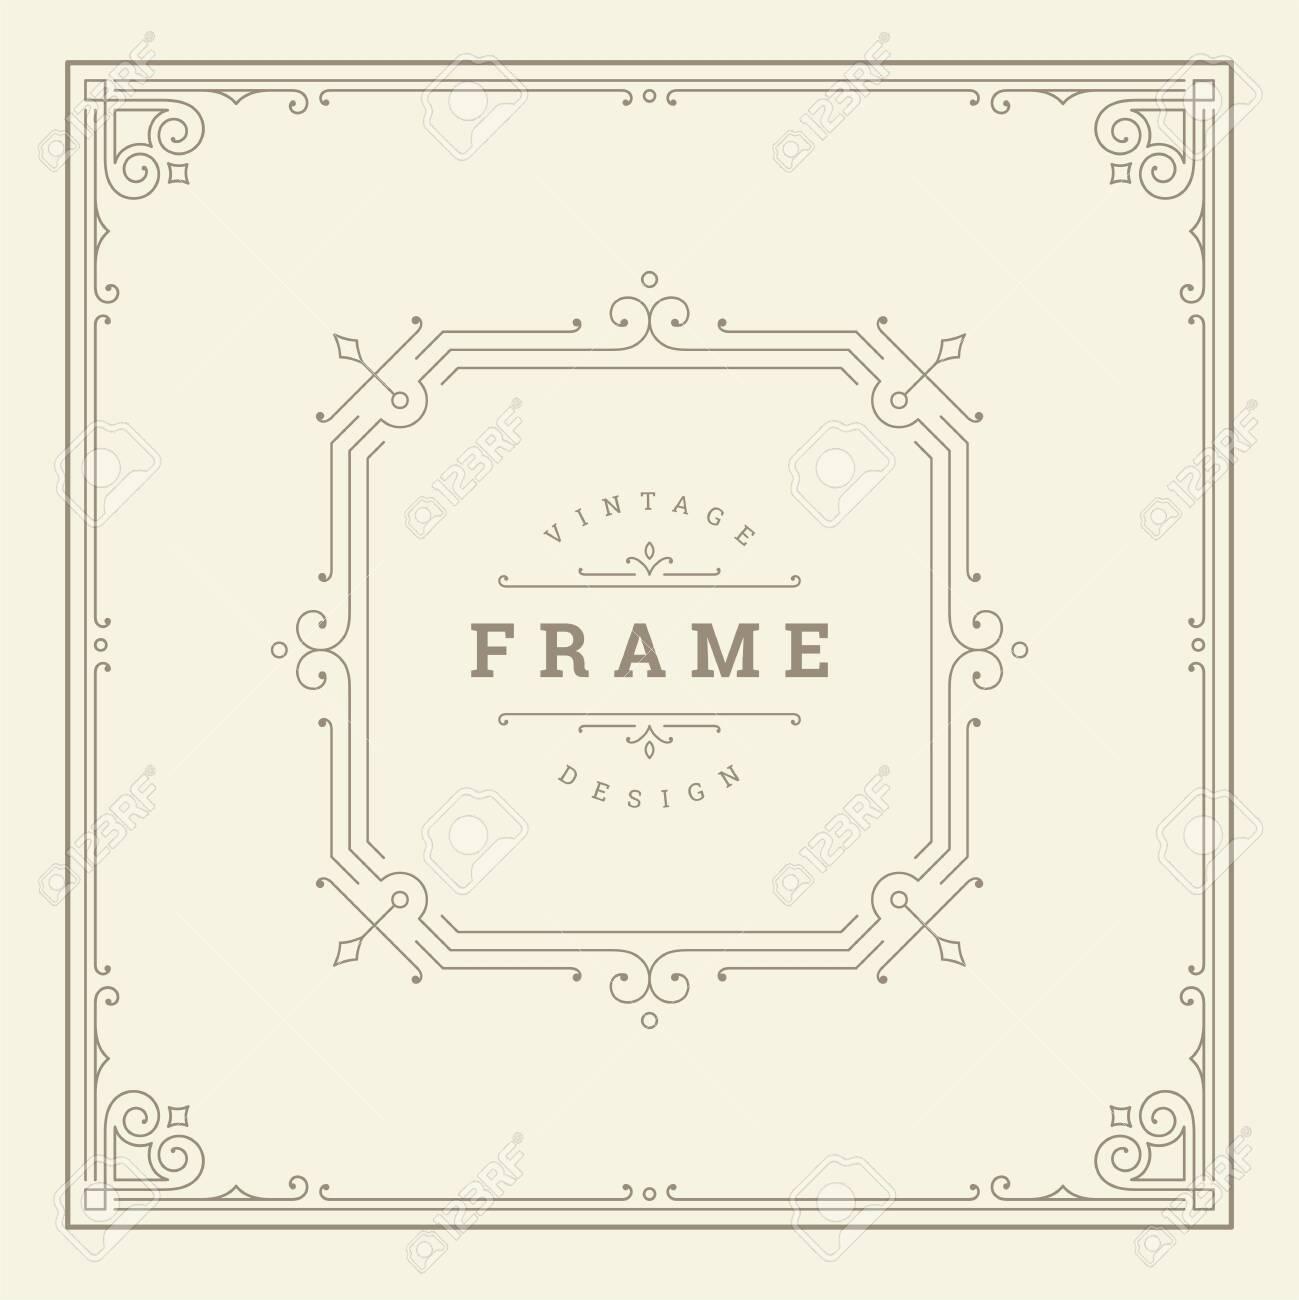 Vintage flourishes ornament swirls lines frame template - 136722278